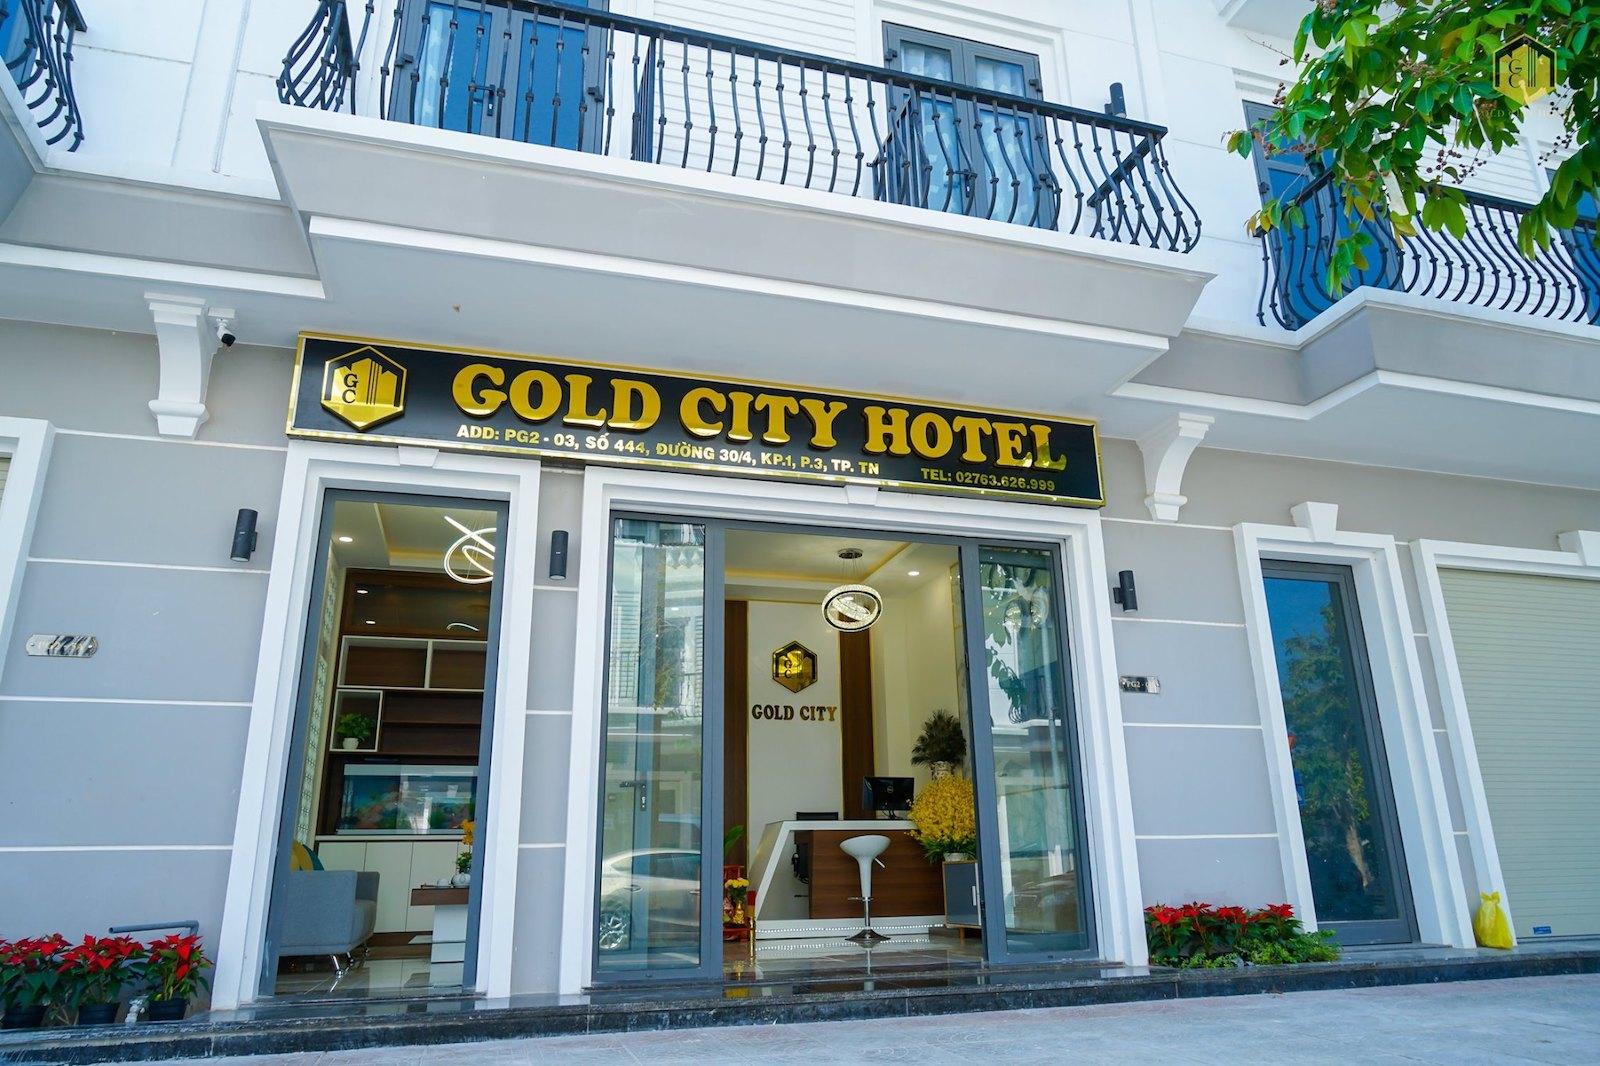 Image of Gold City Hotel in Tay Ninh, Vietnam